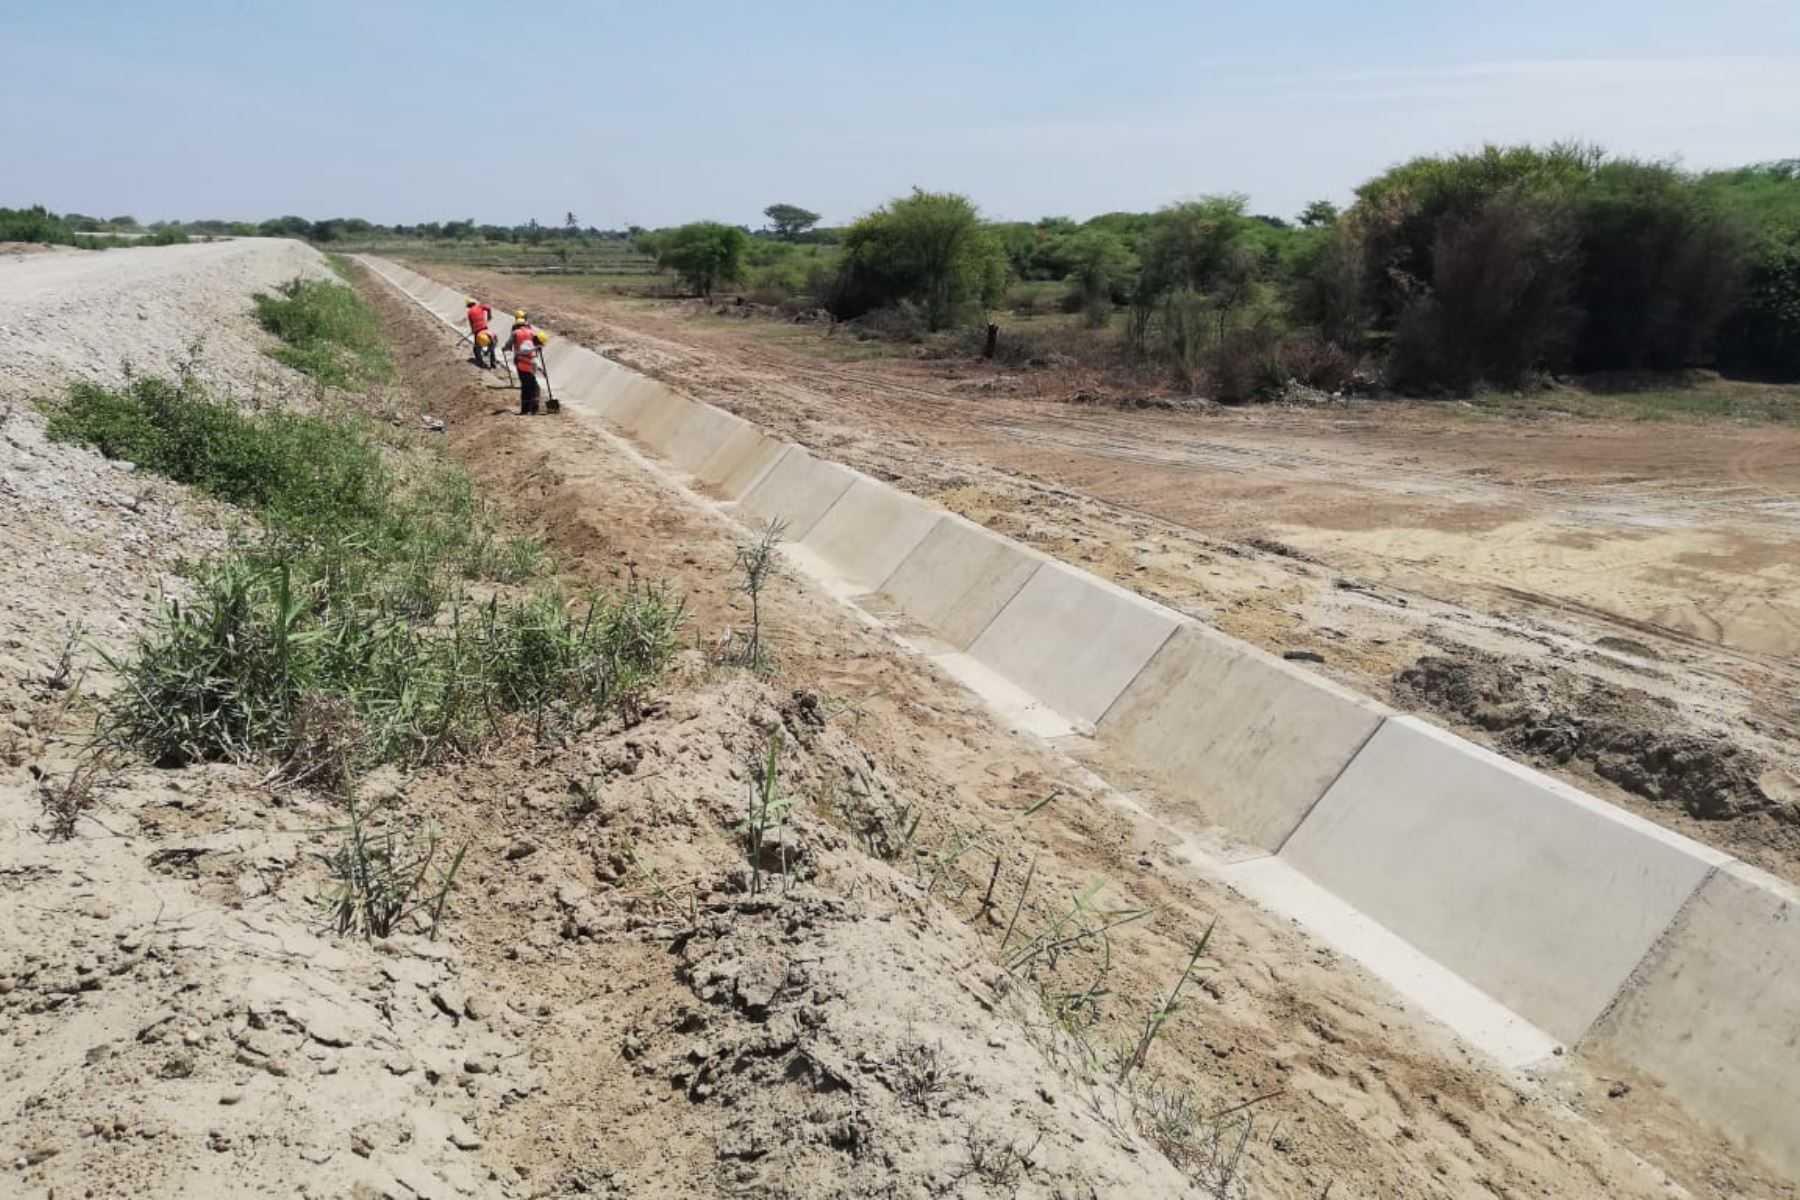 Ministerio de Agricultura y Riego supervisa avances en obras de infraestructura de riego en Piura. ANDINA/Difusión